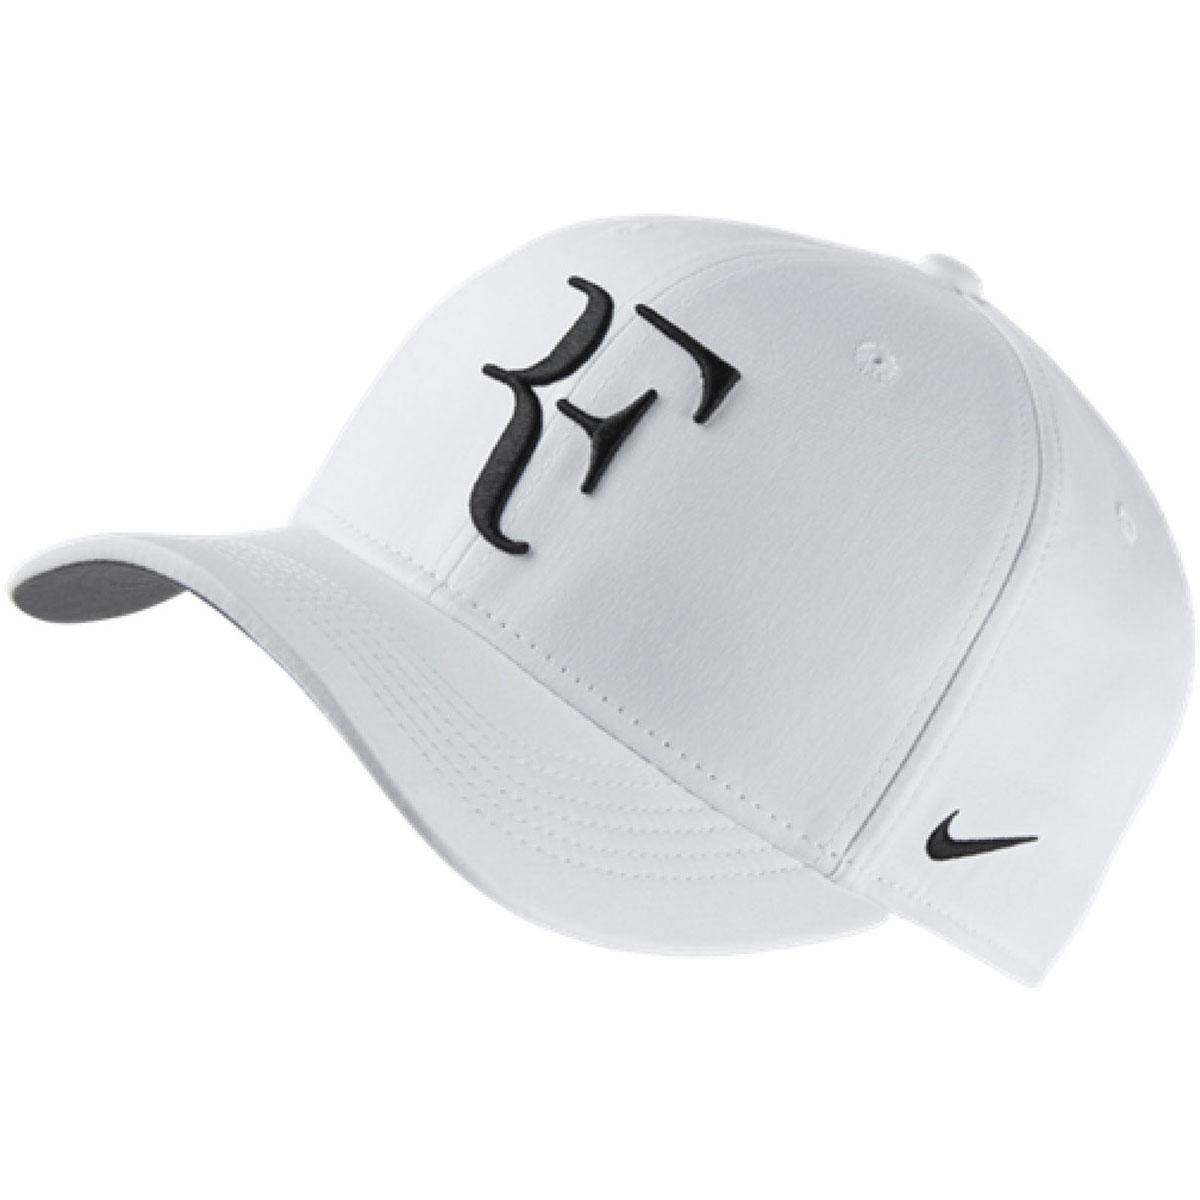 714bf15fbf8 ... Buy Nike Roger Federer Hybrid Cap White Online at Lowest Price in